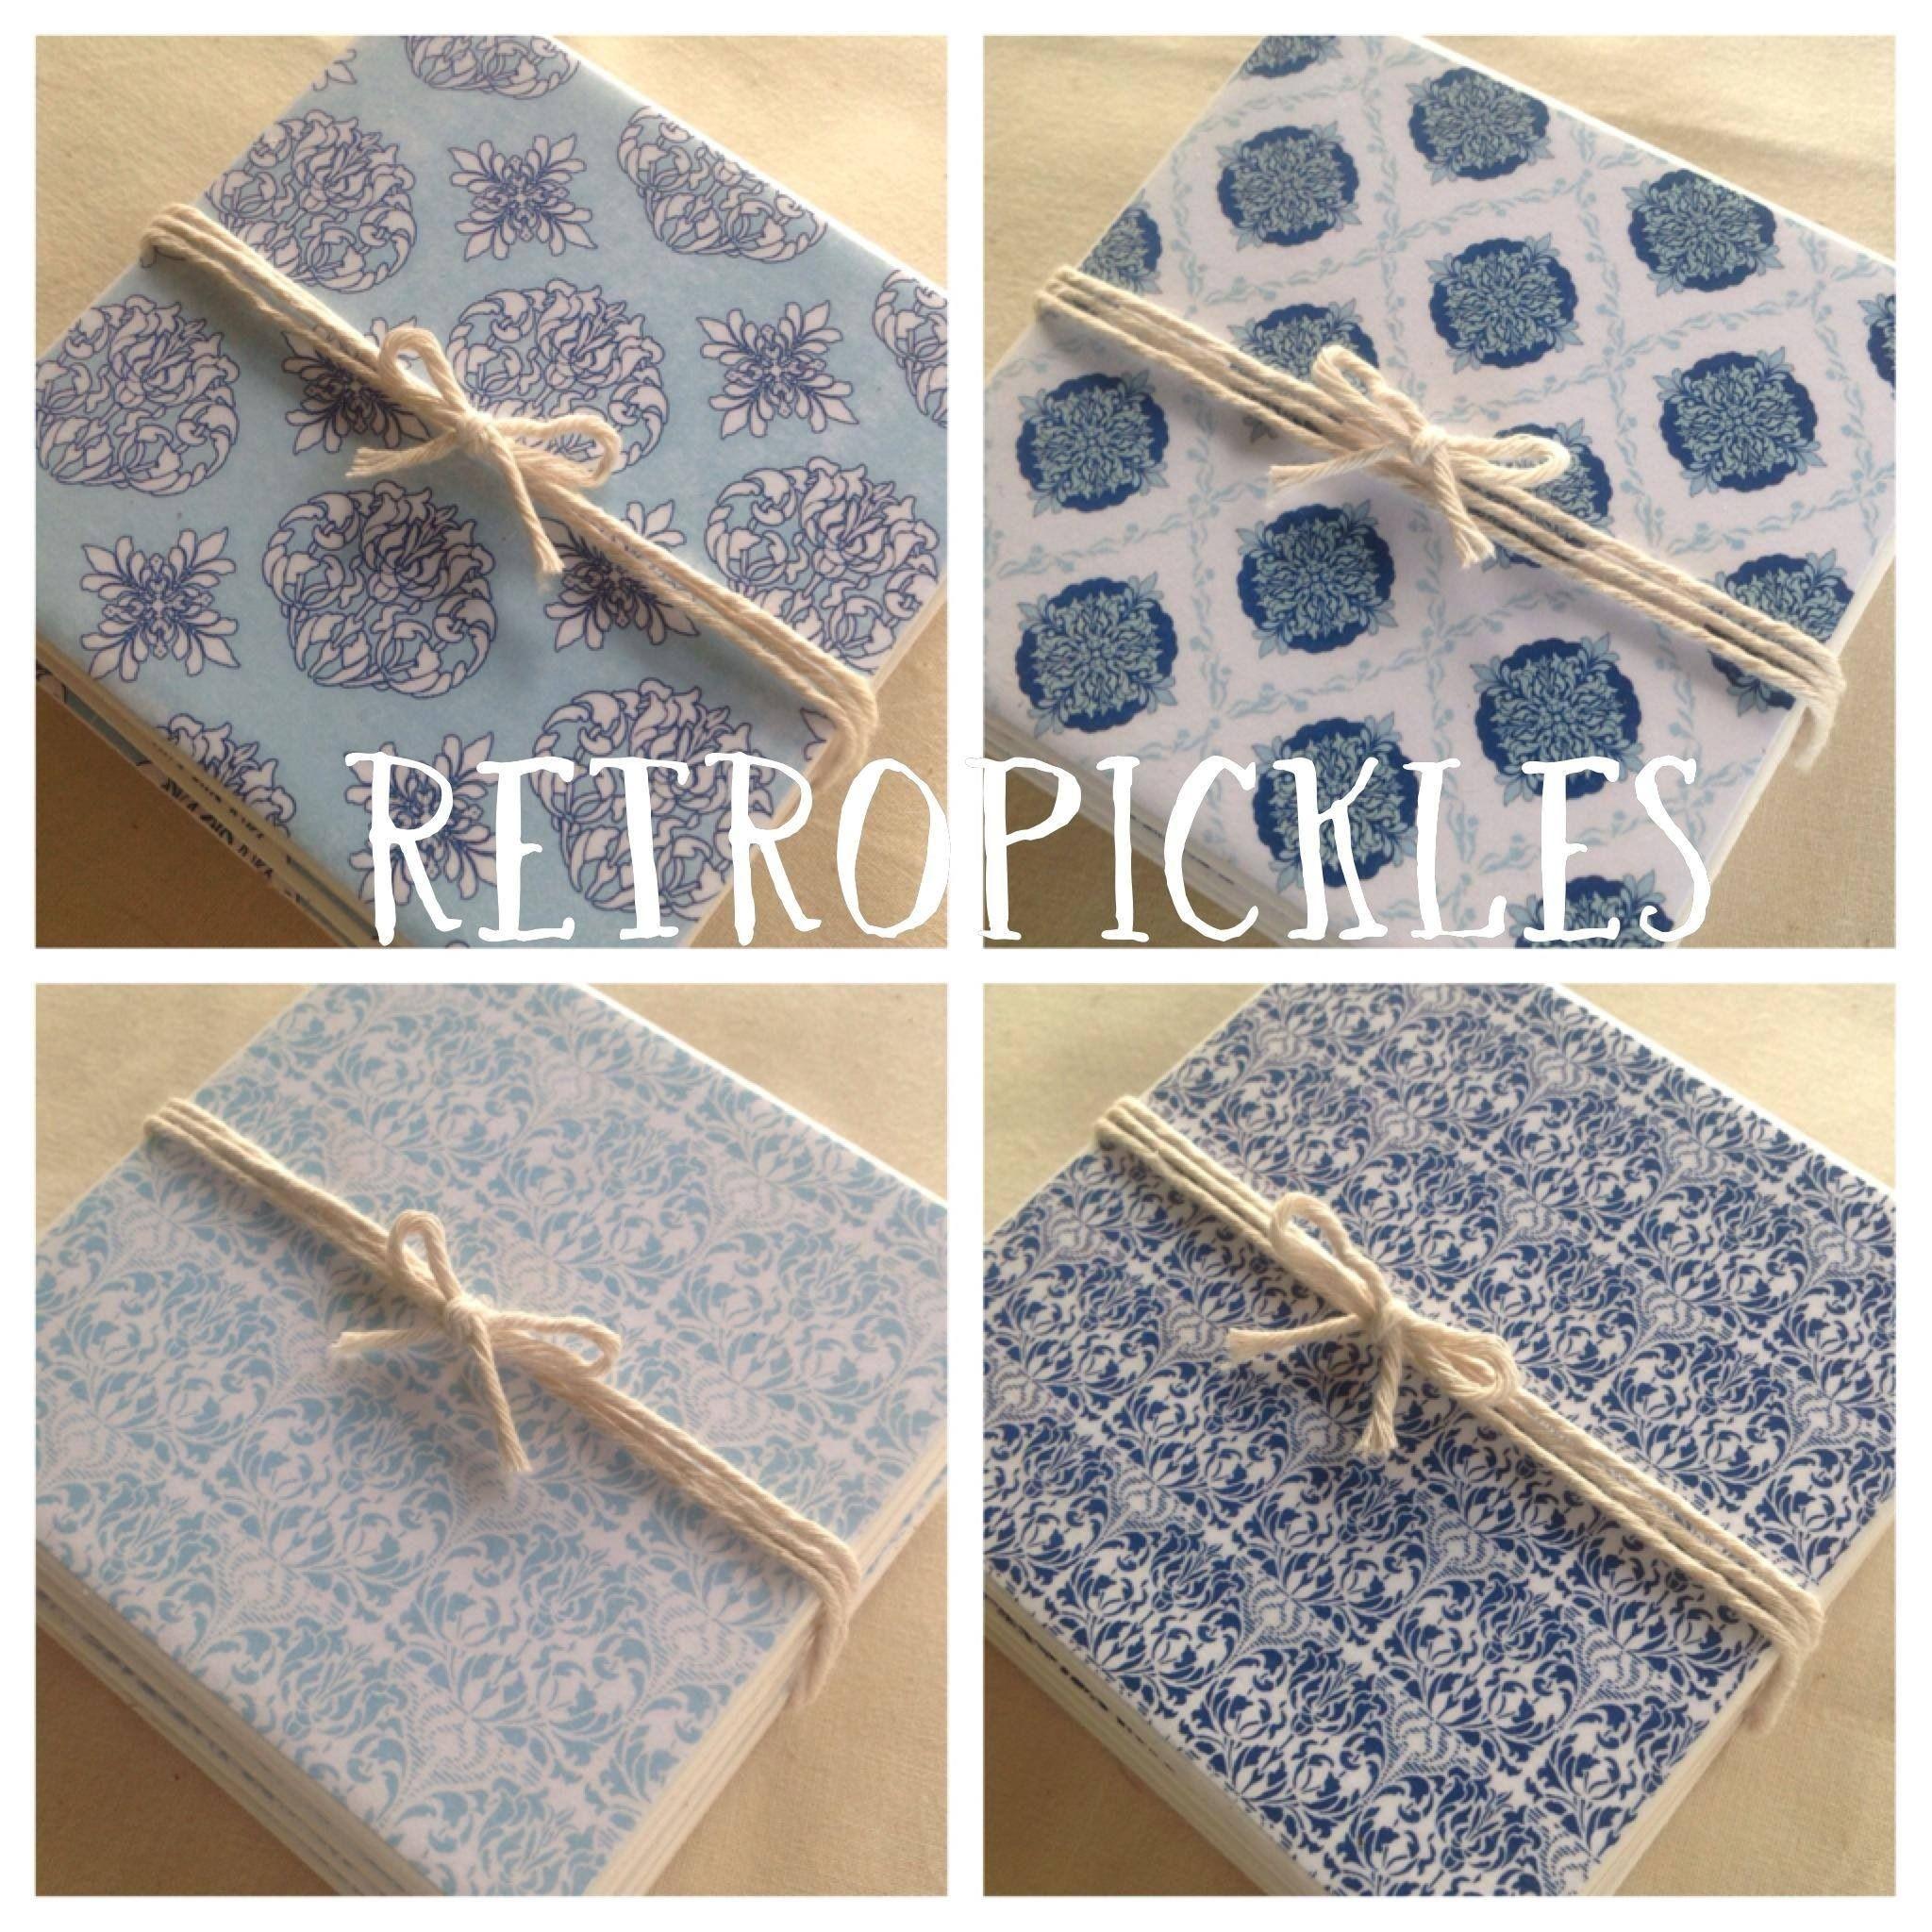 Ceramic tiles for crafts